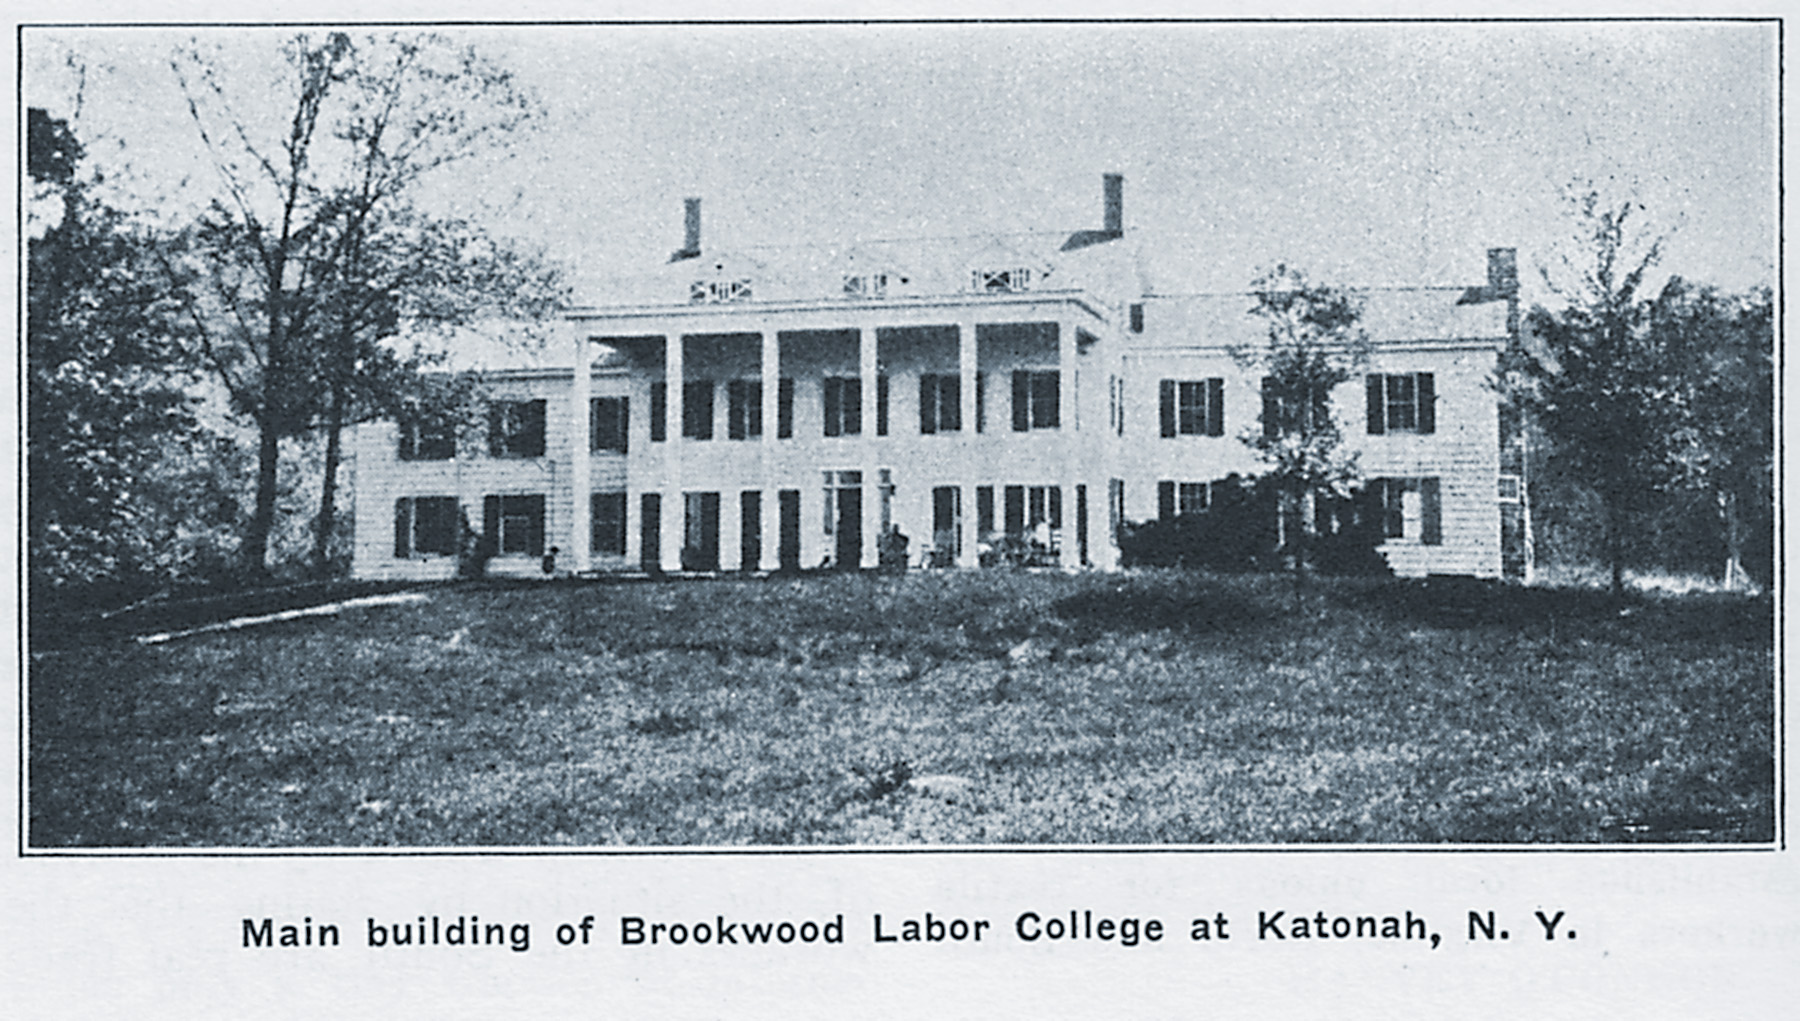 Brookwood Labor College - Wikipedia